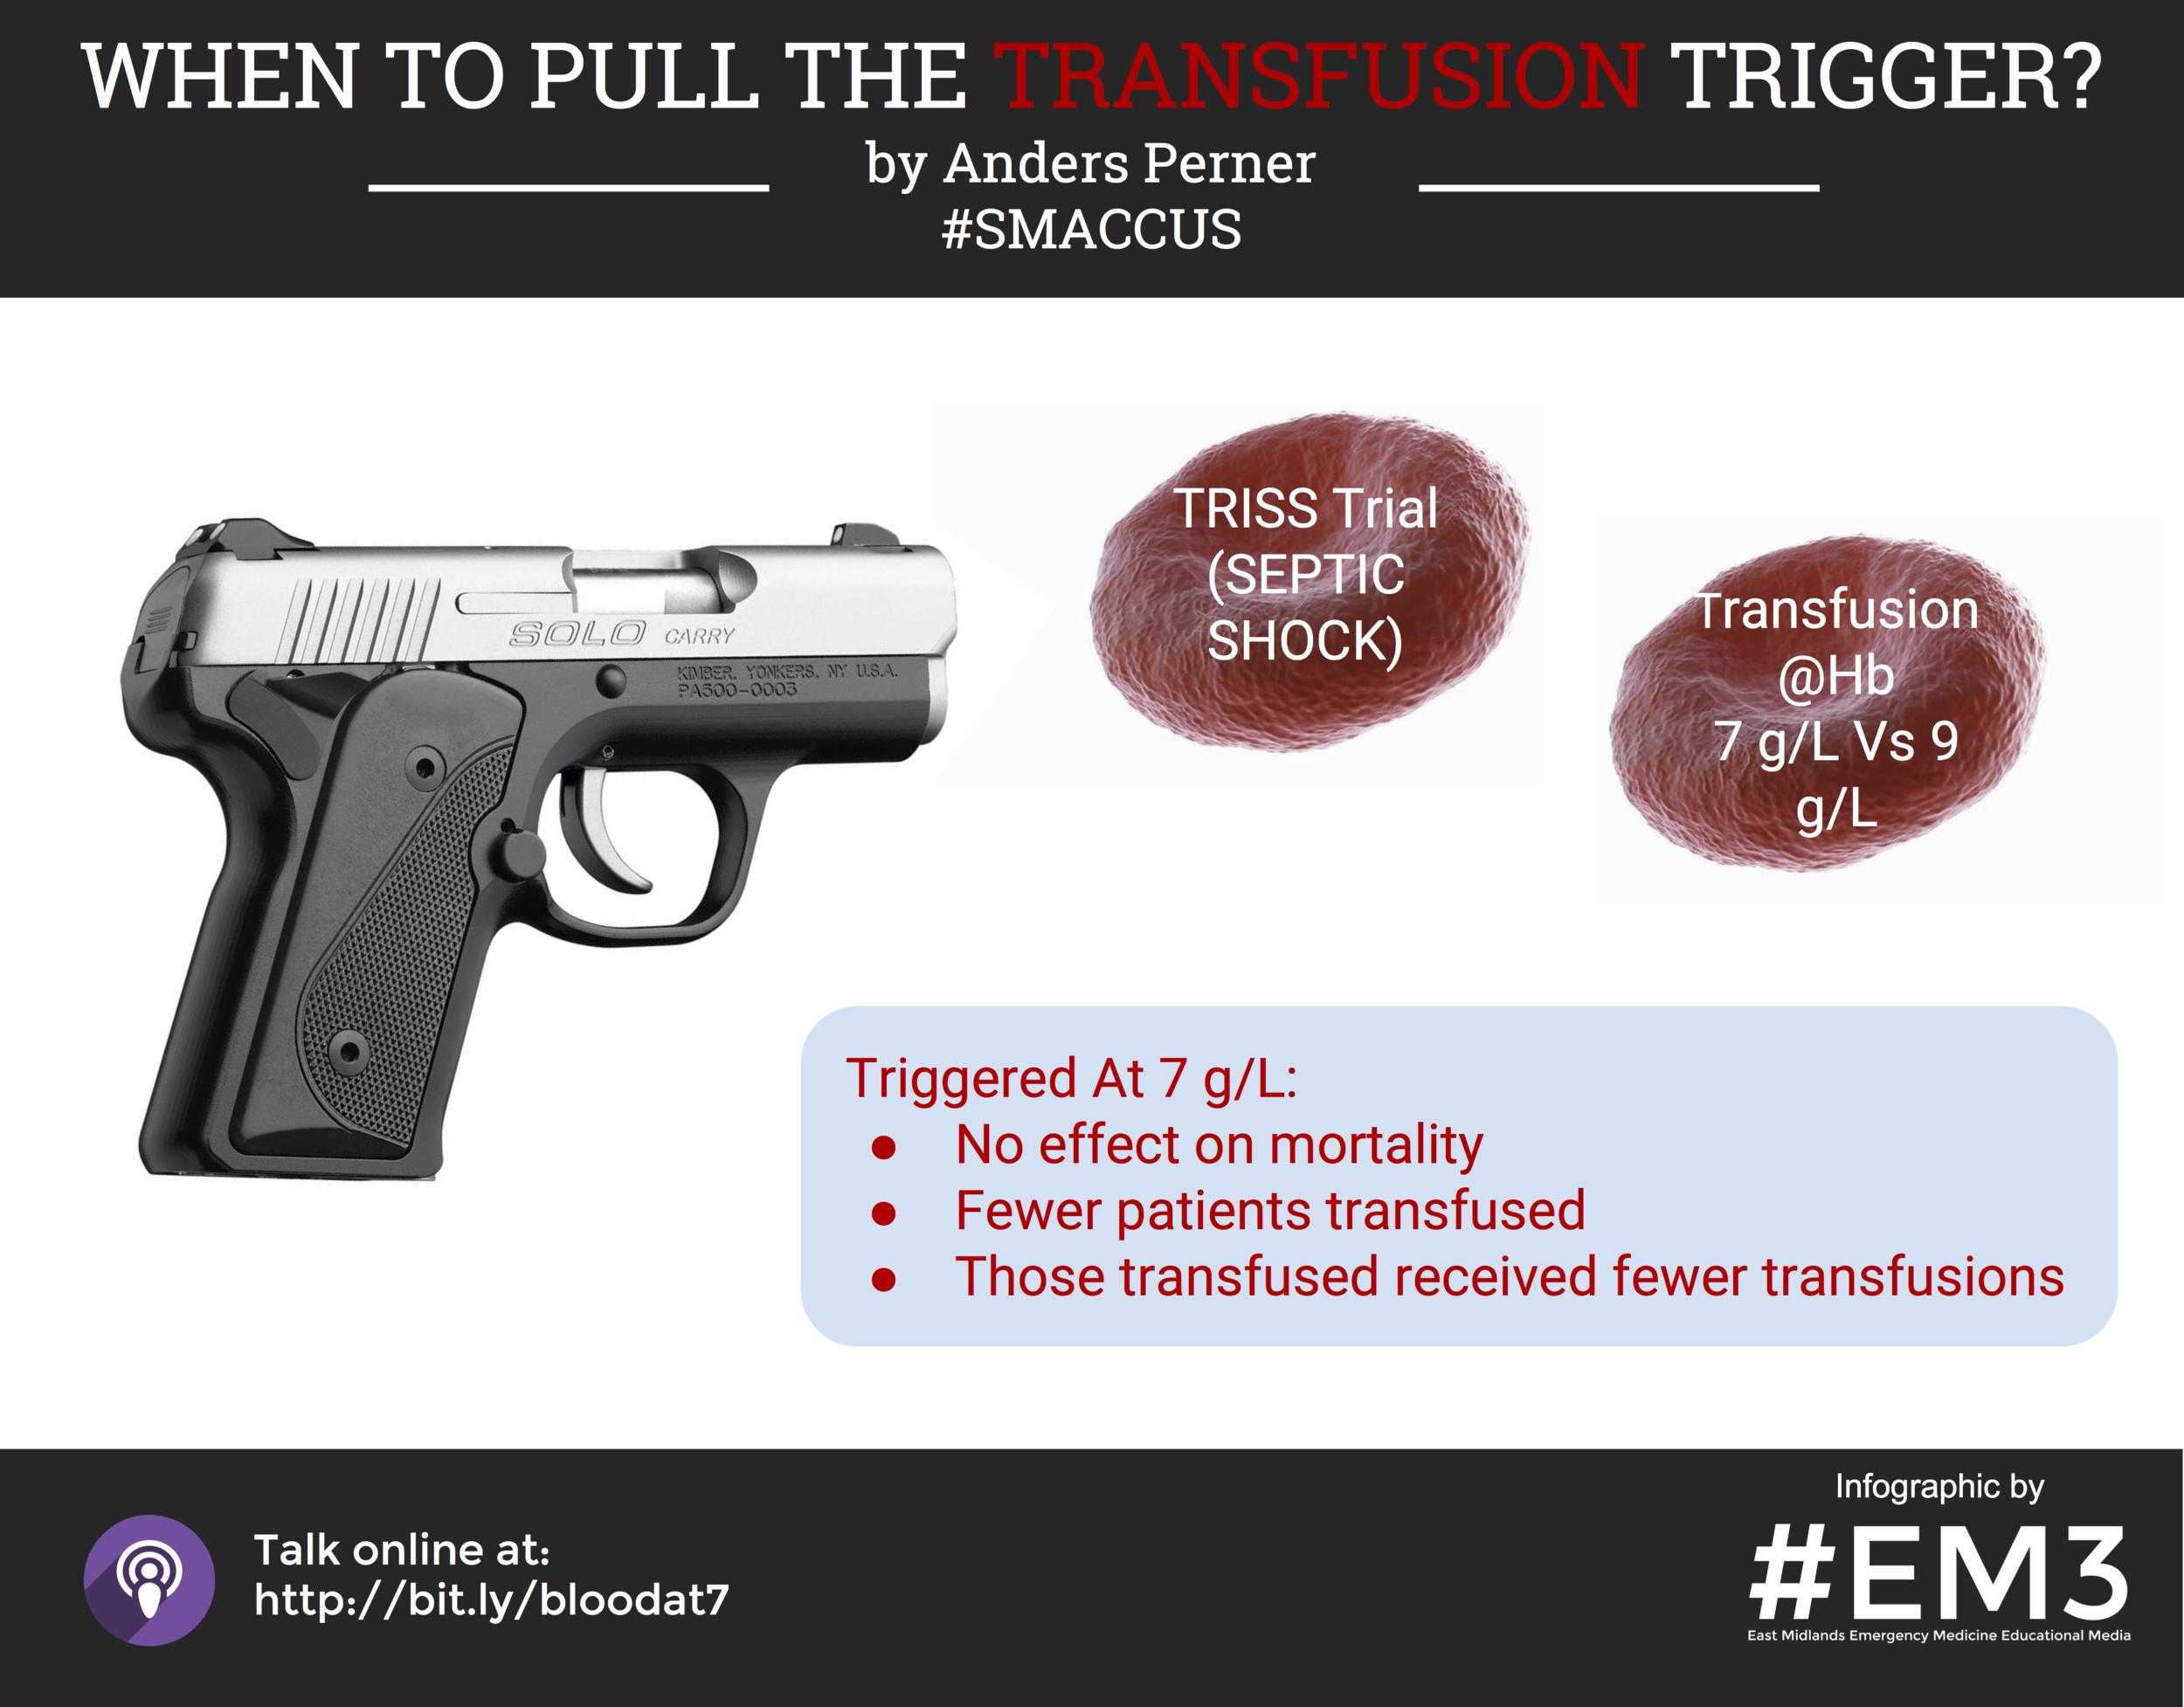 Transfusion Trigger